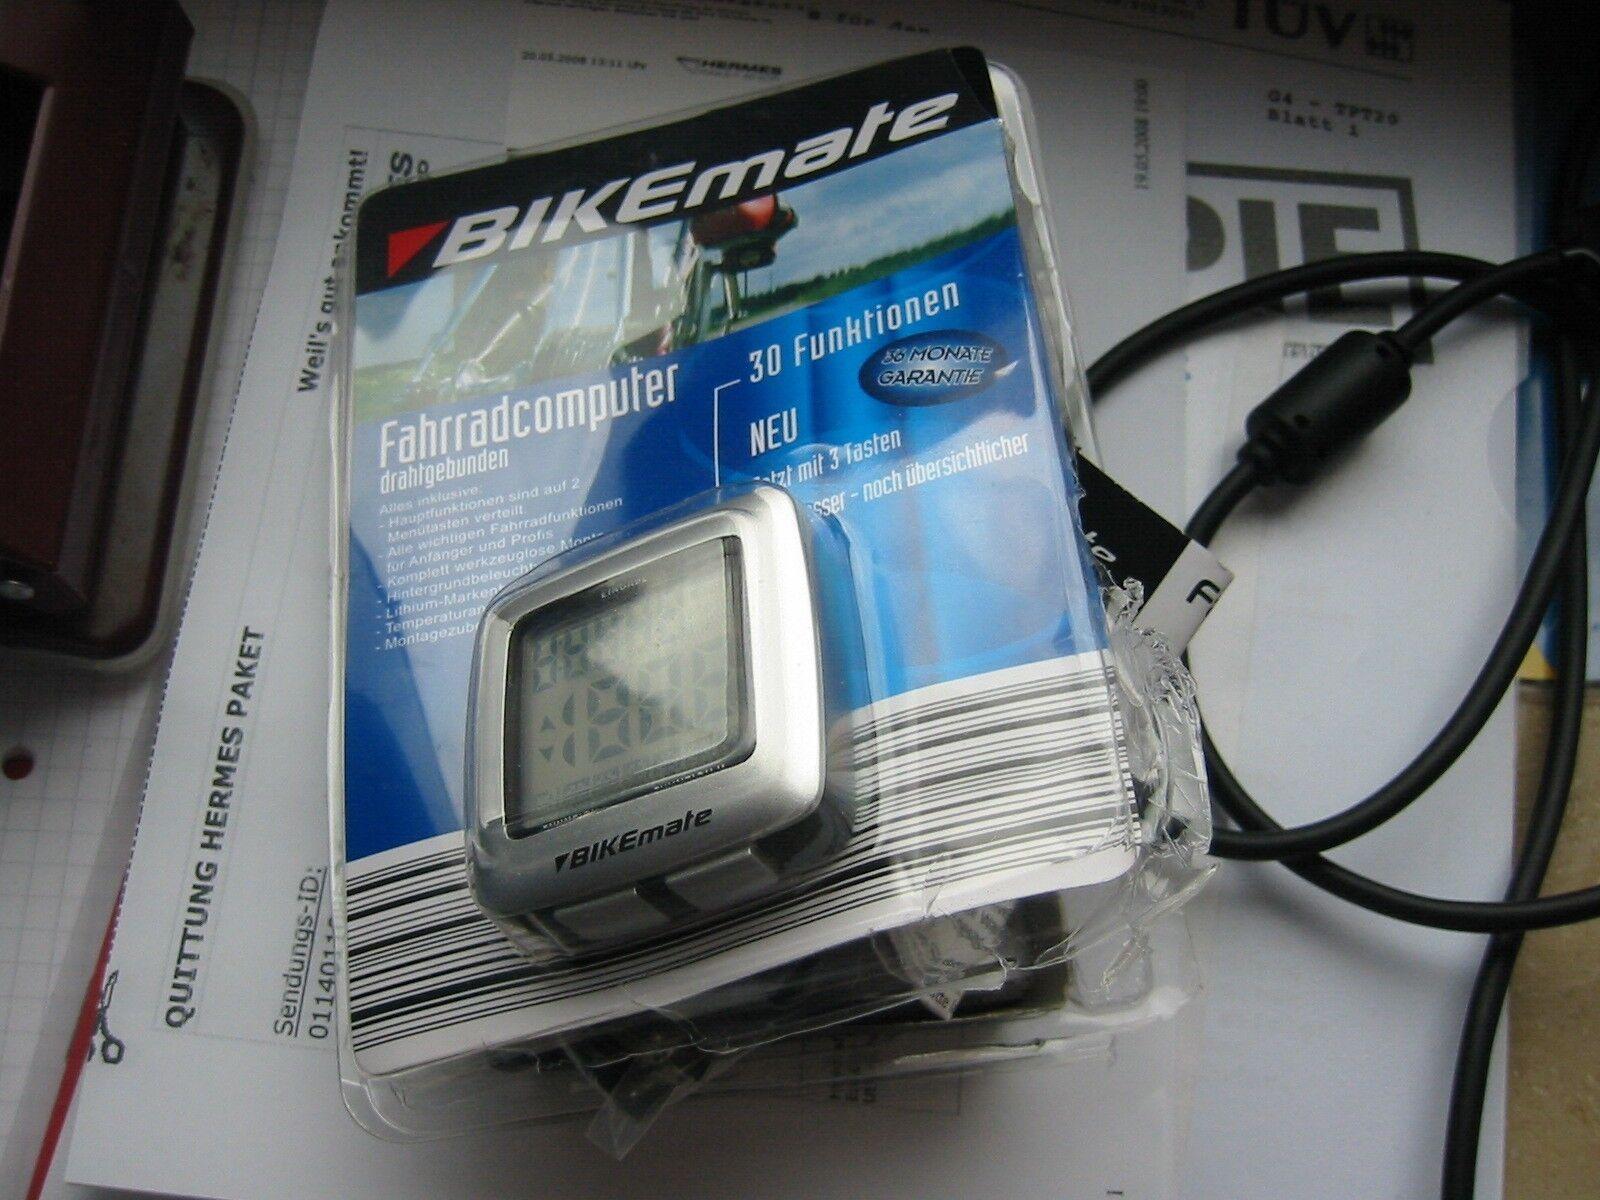 Fahrradcomputer Wo Anbringen : Bikemate fahrradcomputer es funktioniert doch vespa